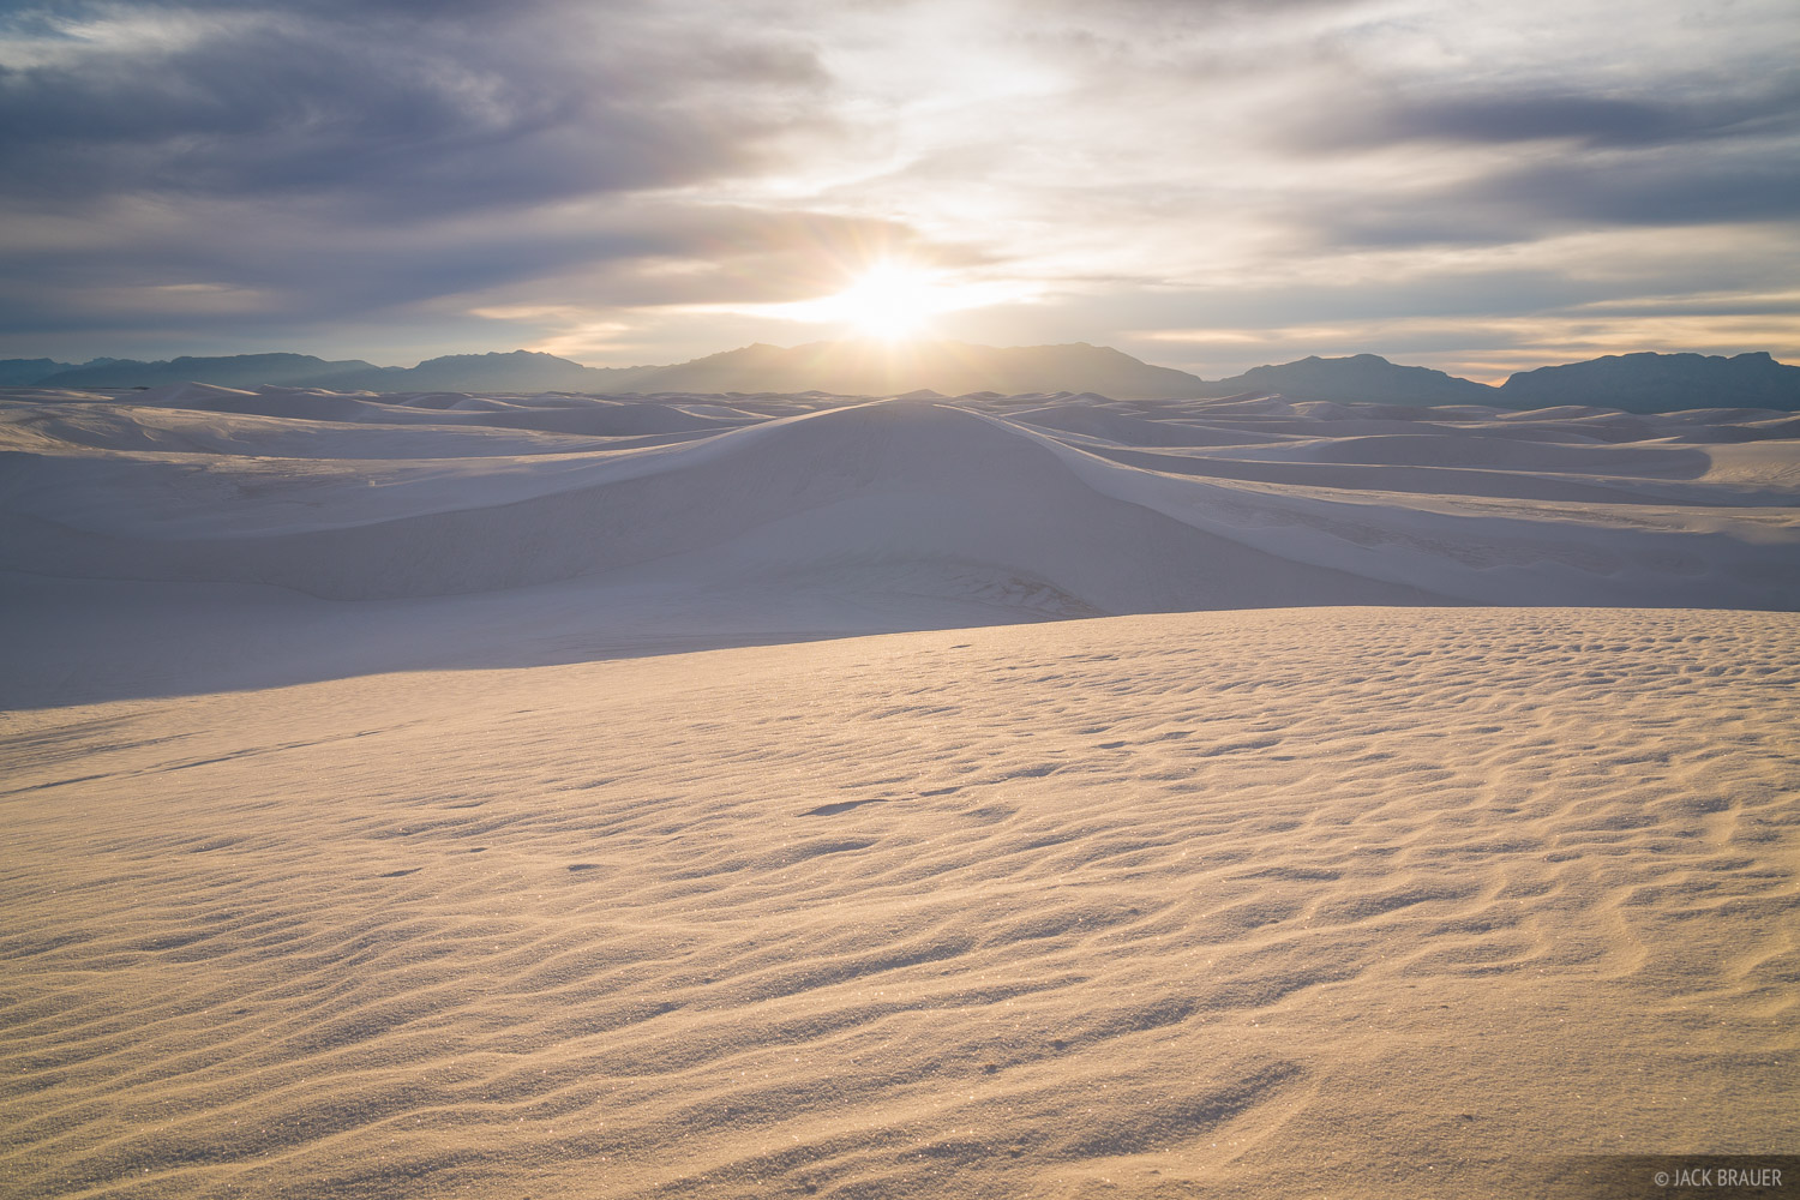 Sunset in the White Sands dunes, December.